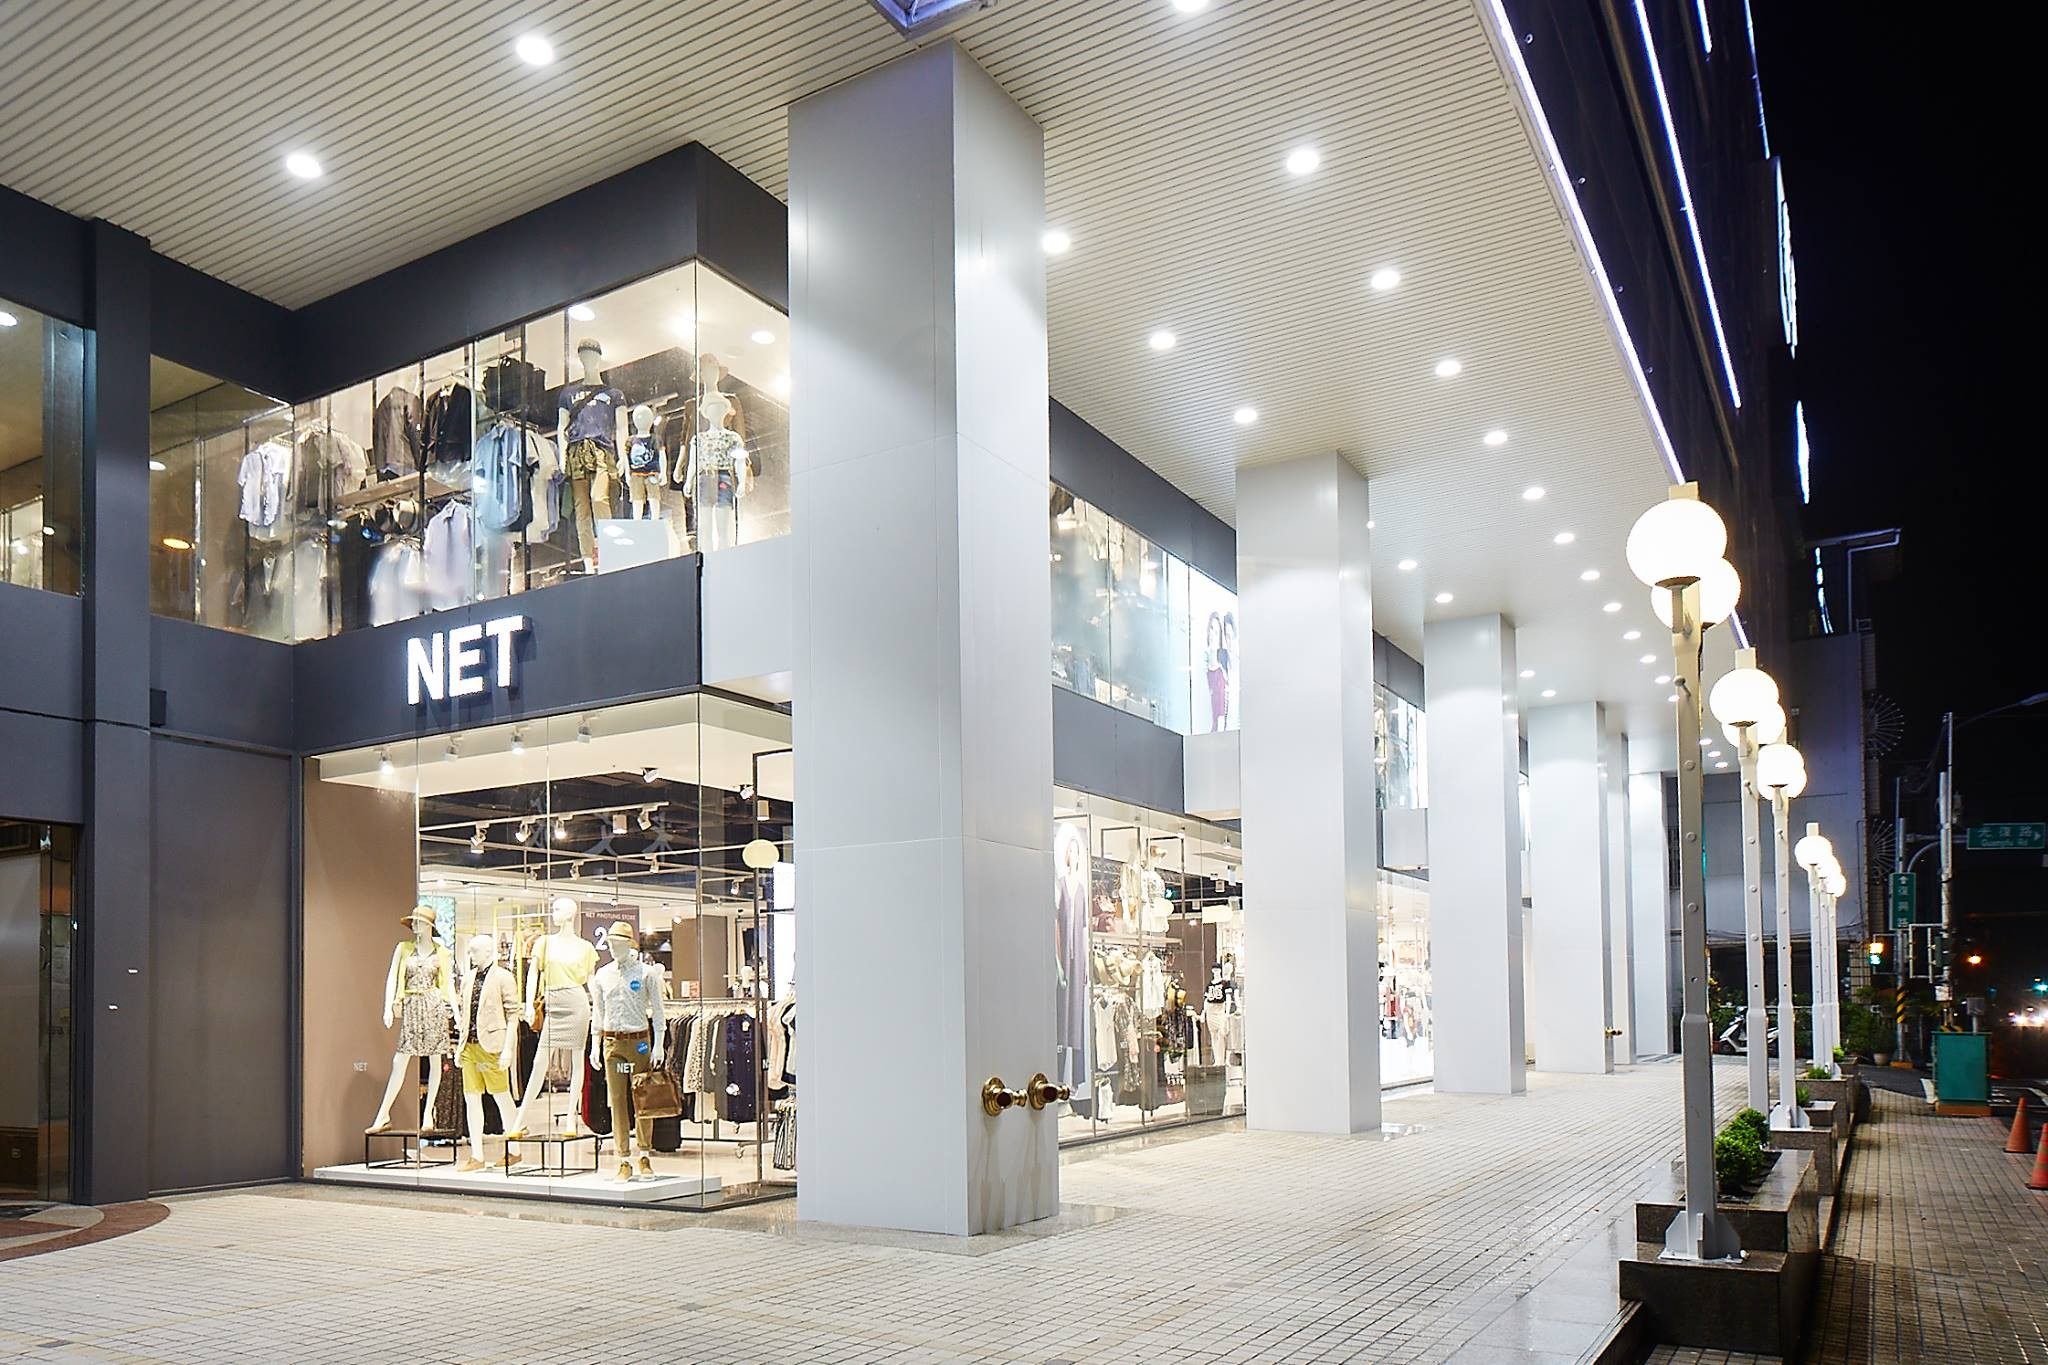 NET,主富服裝(圖/翻攝NET臉書專頁)